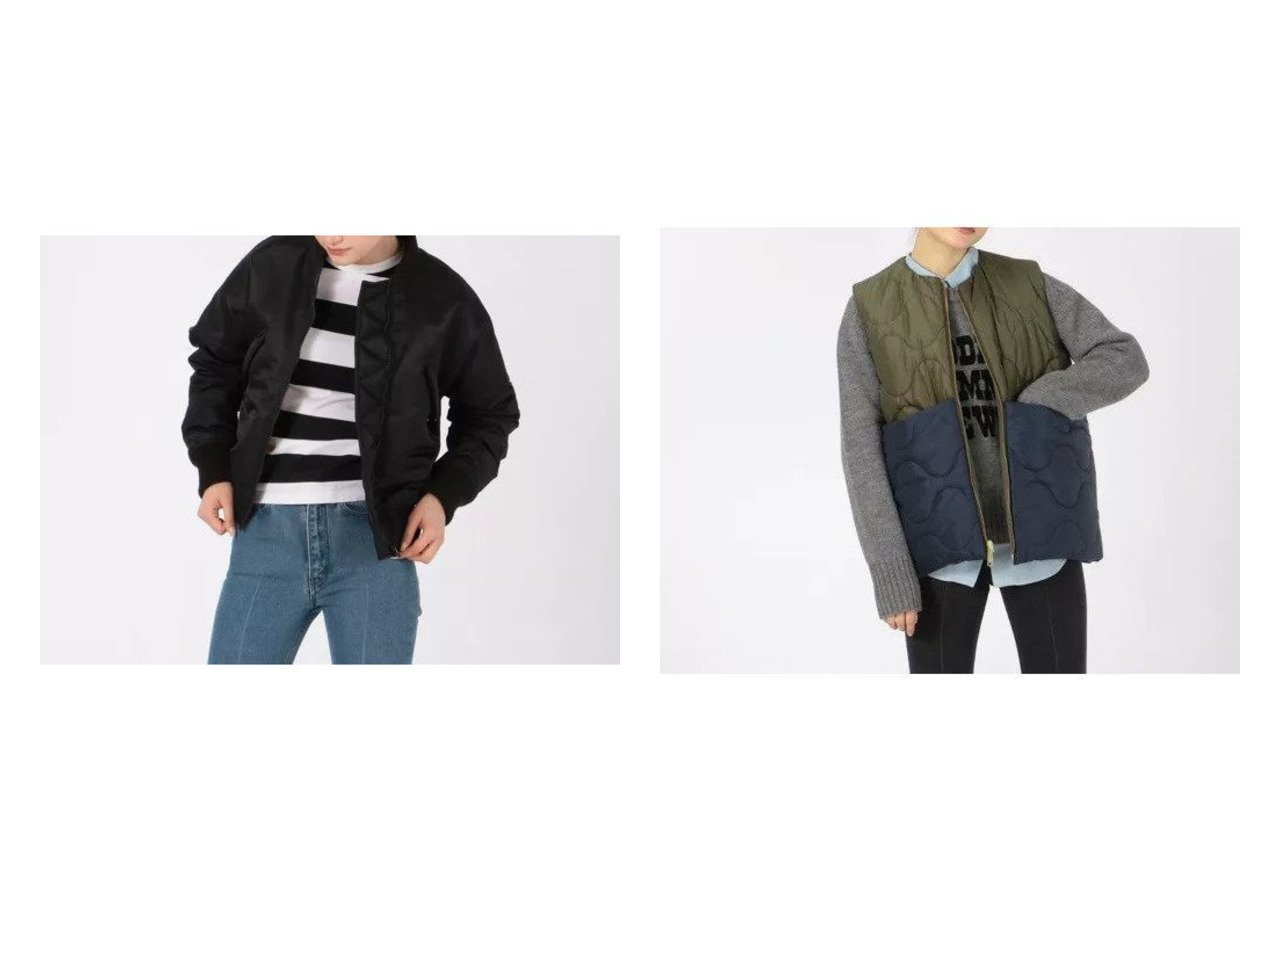 【MADISONBLUE/マディソンブルー】のCOMPACT MA-1 NY TWILL JACKET&NO COLLAR VEST QUILTING JACKET 【アウター】おすすめ!人気、トレンド・レディースファッションの通販 おすすめで人気の流行・トレンド、ファッションの通販商品 インテリア・家具・メンズファッション・キッズファッション・レディースファッション・服の通販 founy(ファニー) https://founy.com/ ファッション Fashion レディースファッション WOMEN アウター Coat Outerwear ジャケット Jackets ブルゾン Blouson/Jackets MA-1 MA-1 コート Coats ショート ジャケット フォルム ブルゾン ミリタリー ヴィンテージ 軽量 キルティング サテン ダウン ベスト ポケット リバーシブル ロング |ID:crp329100000057896